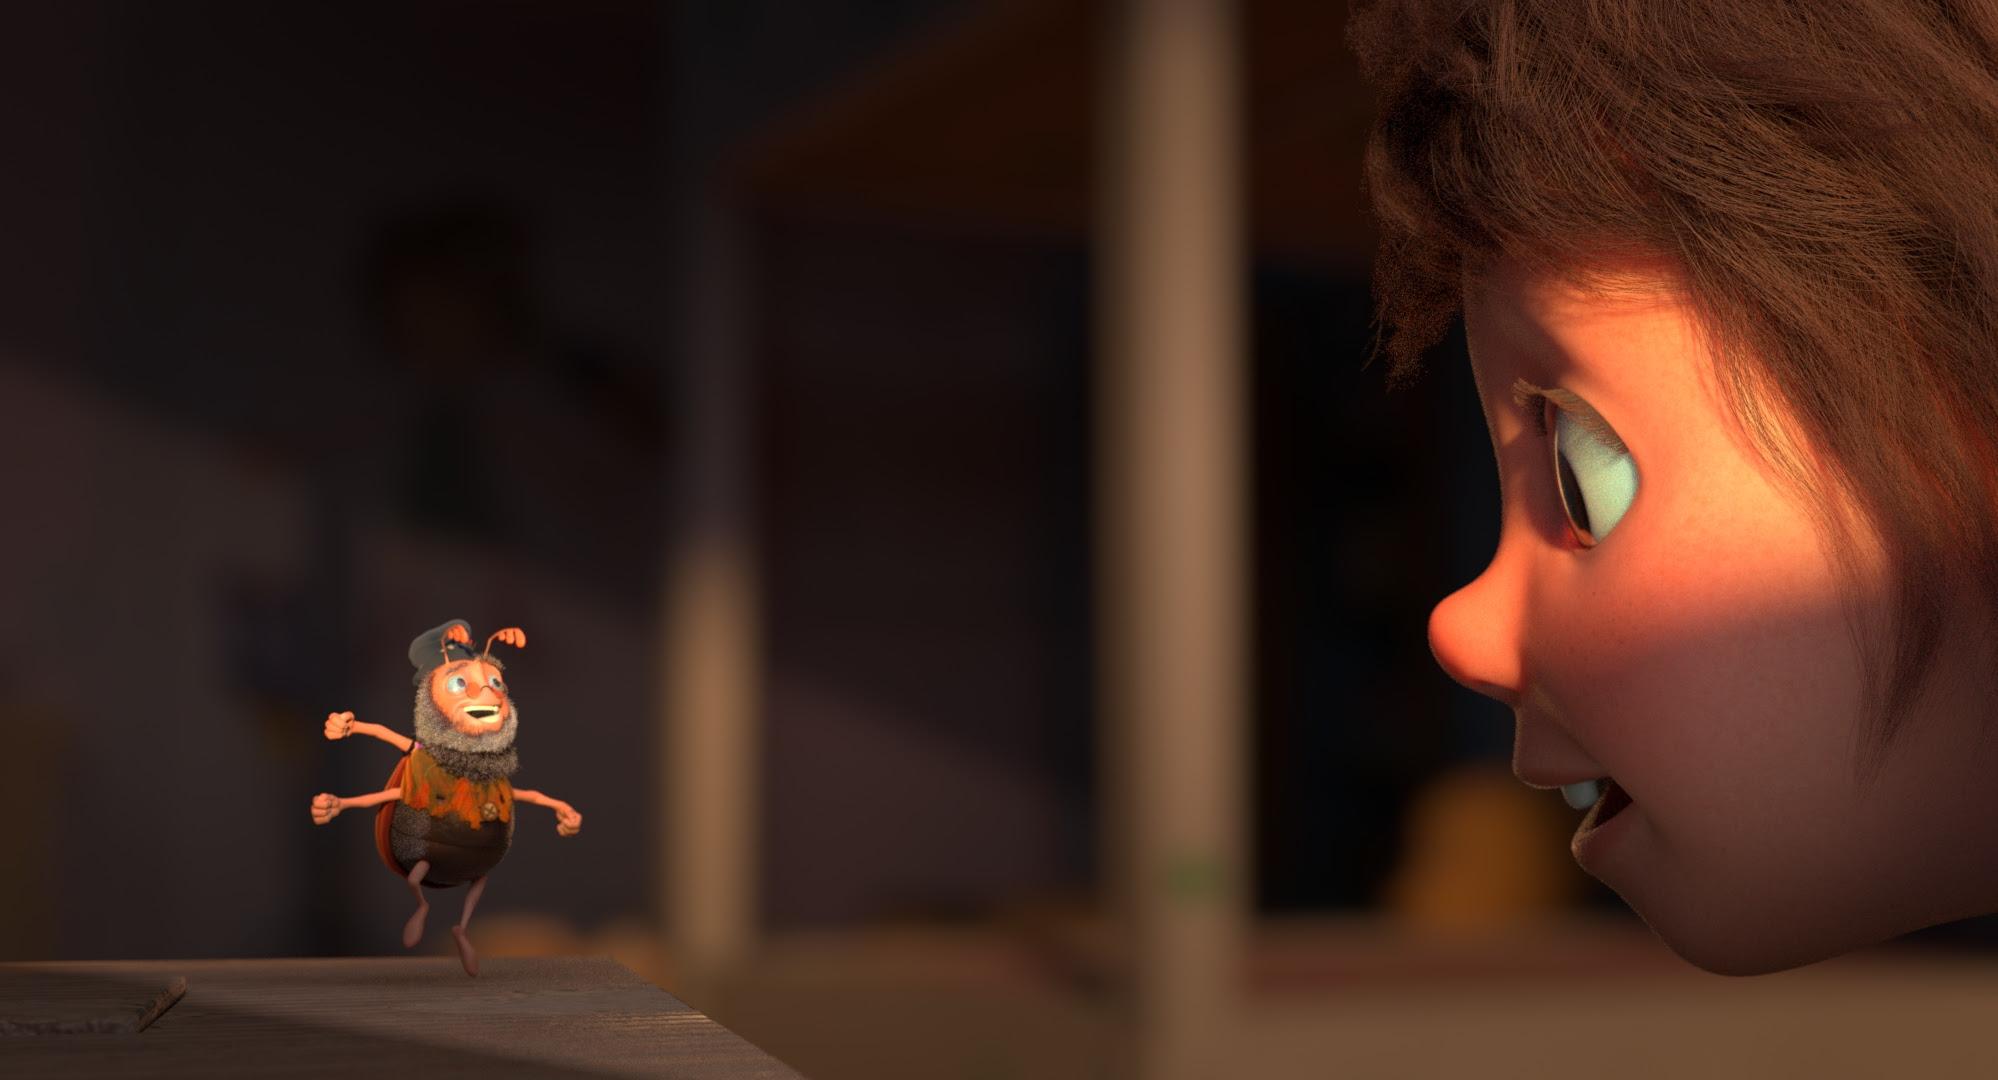 Moonbound Movie Review - DOWNLOAD